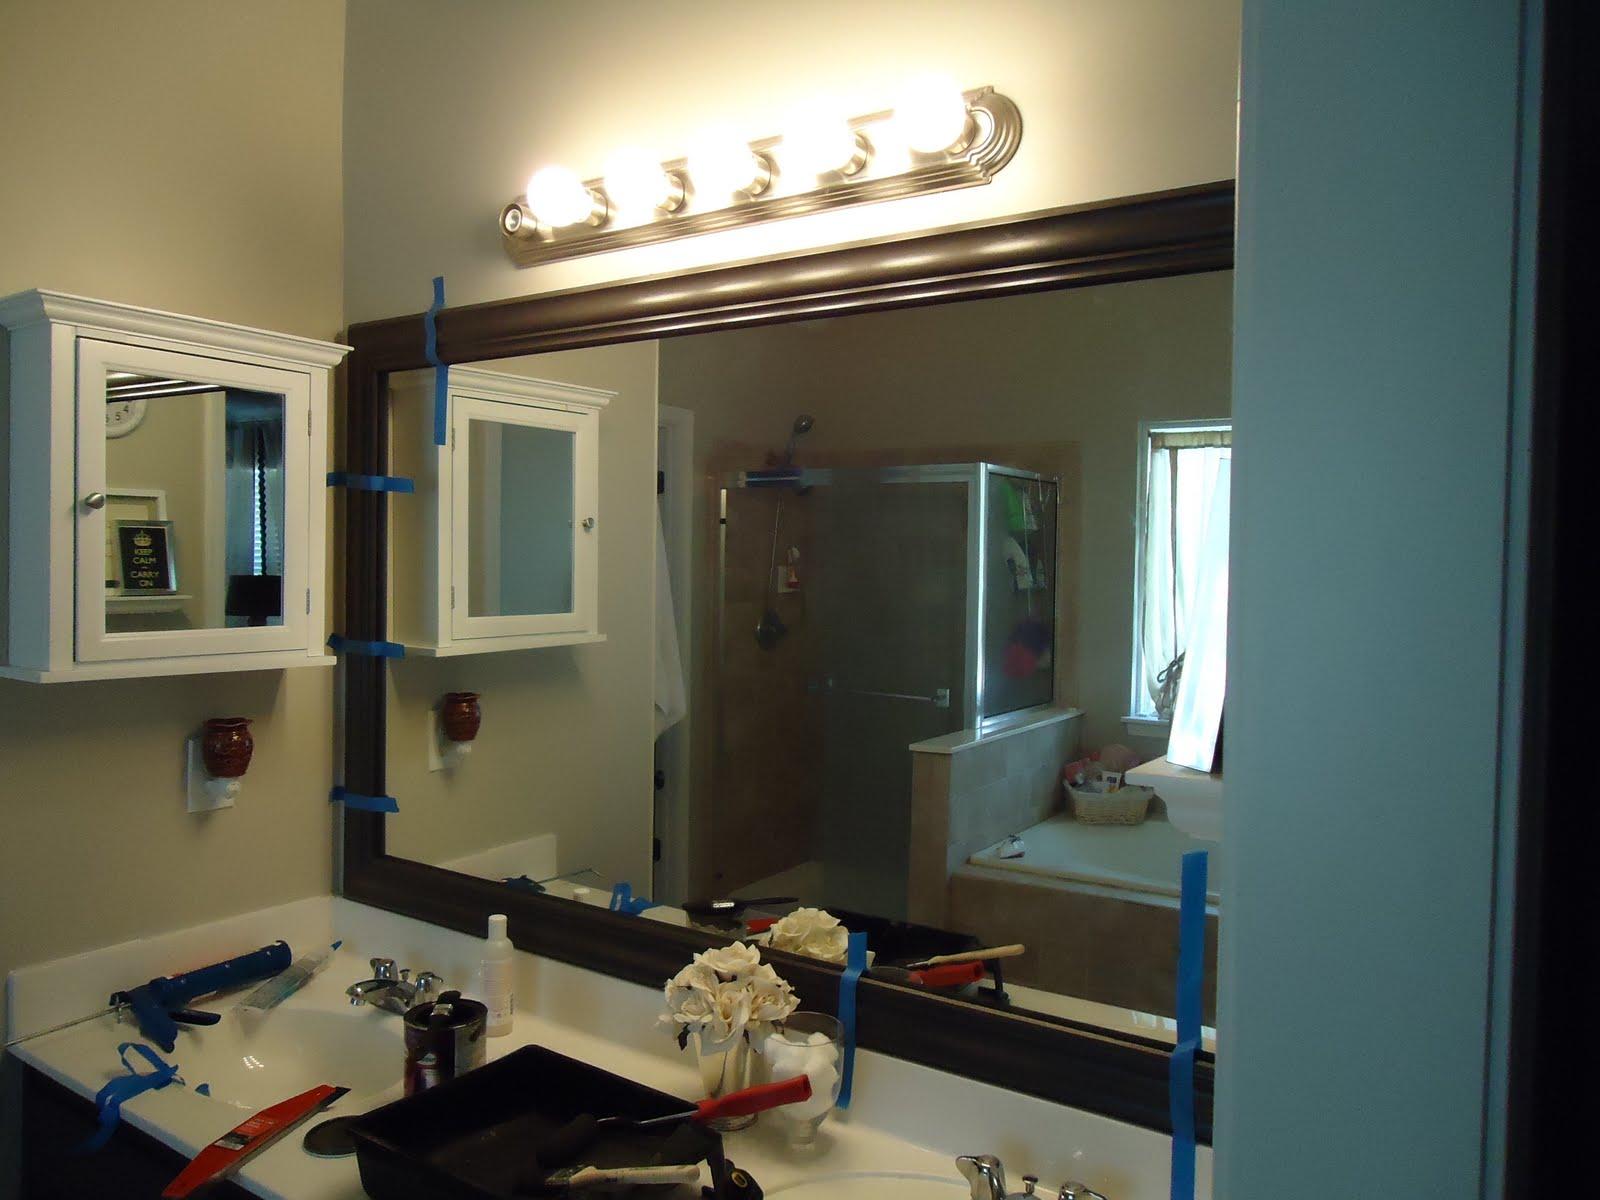 suburban spunk*: $7 vanity light redo